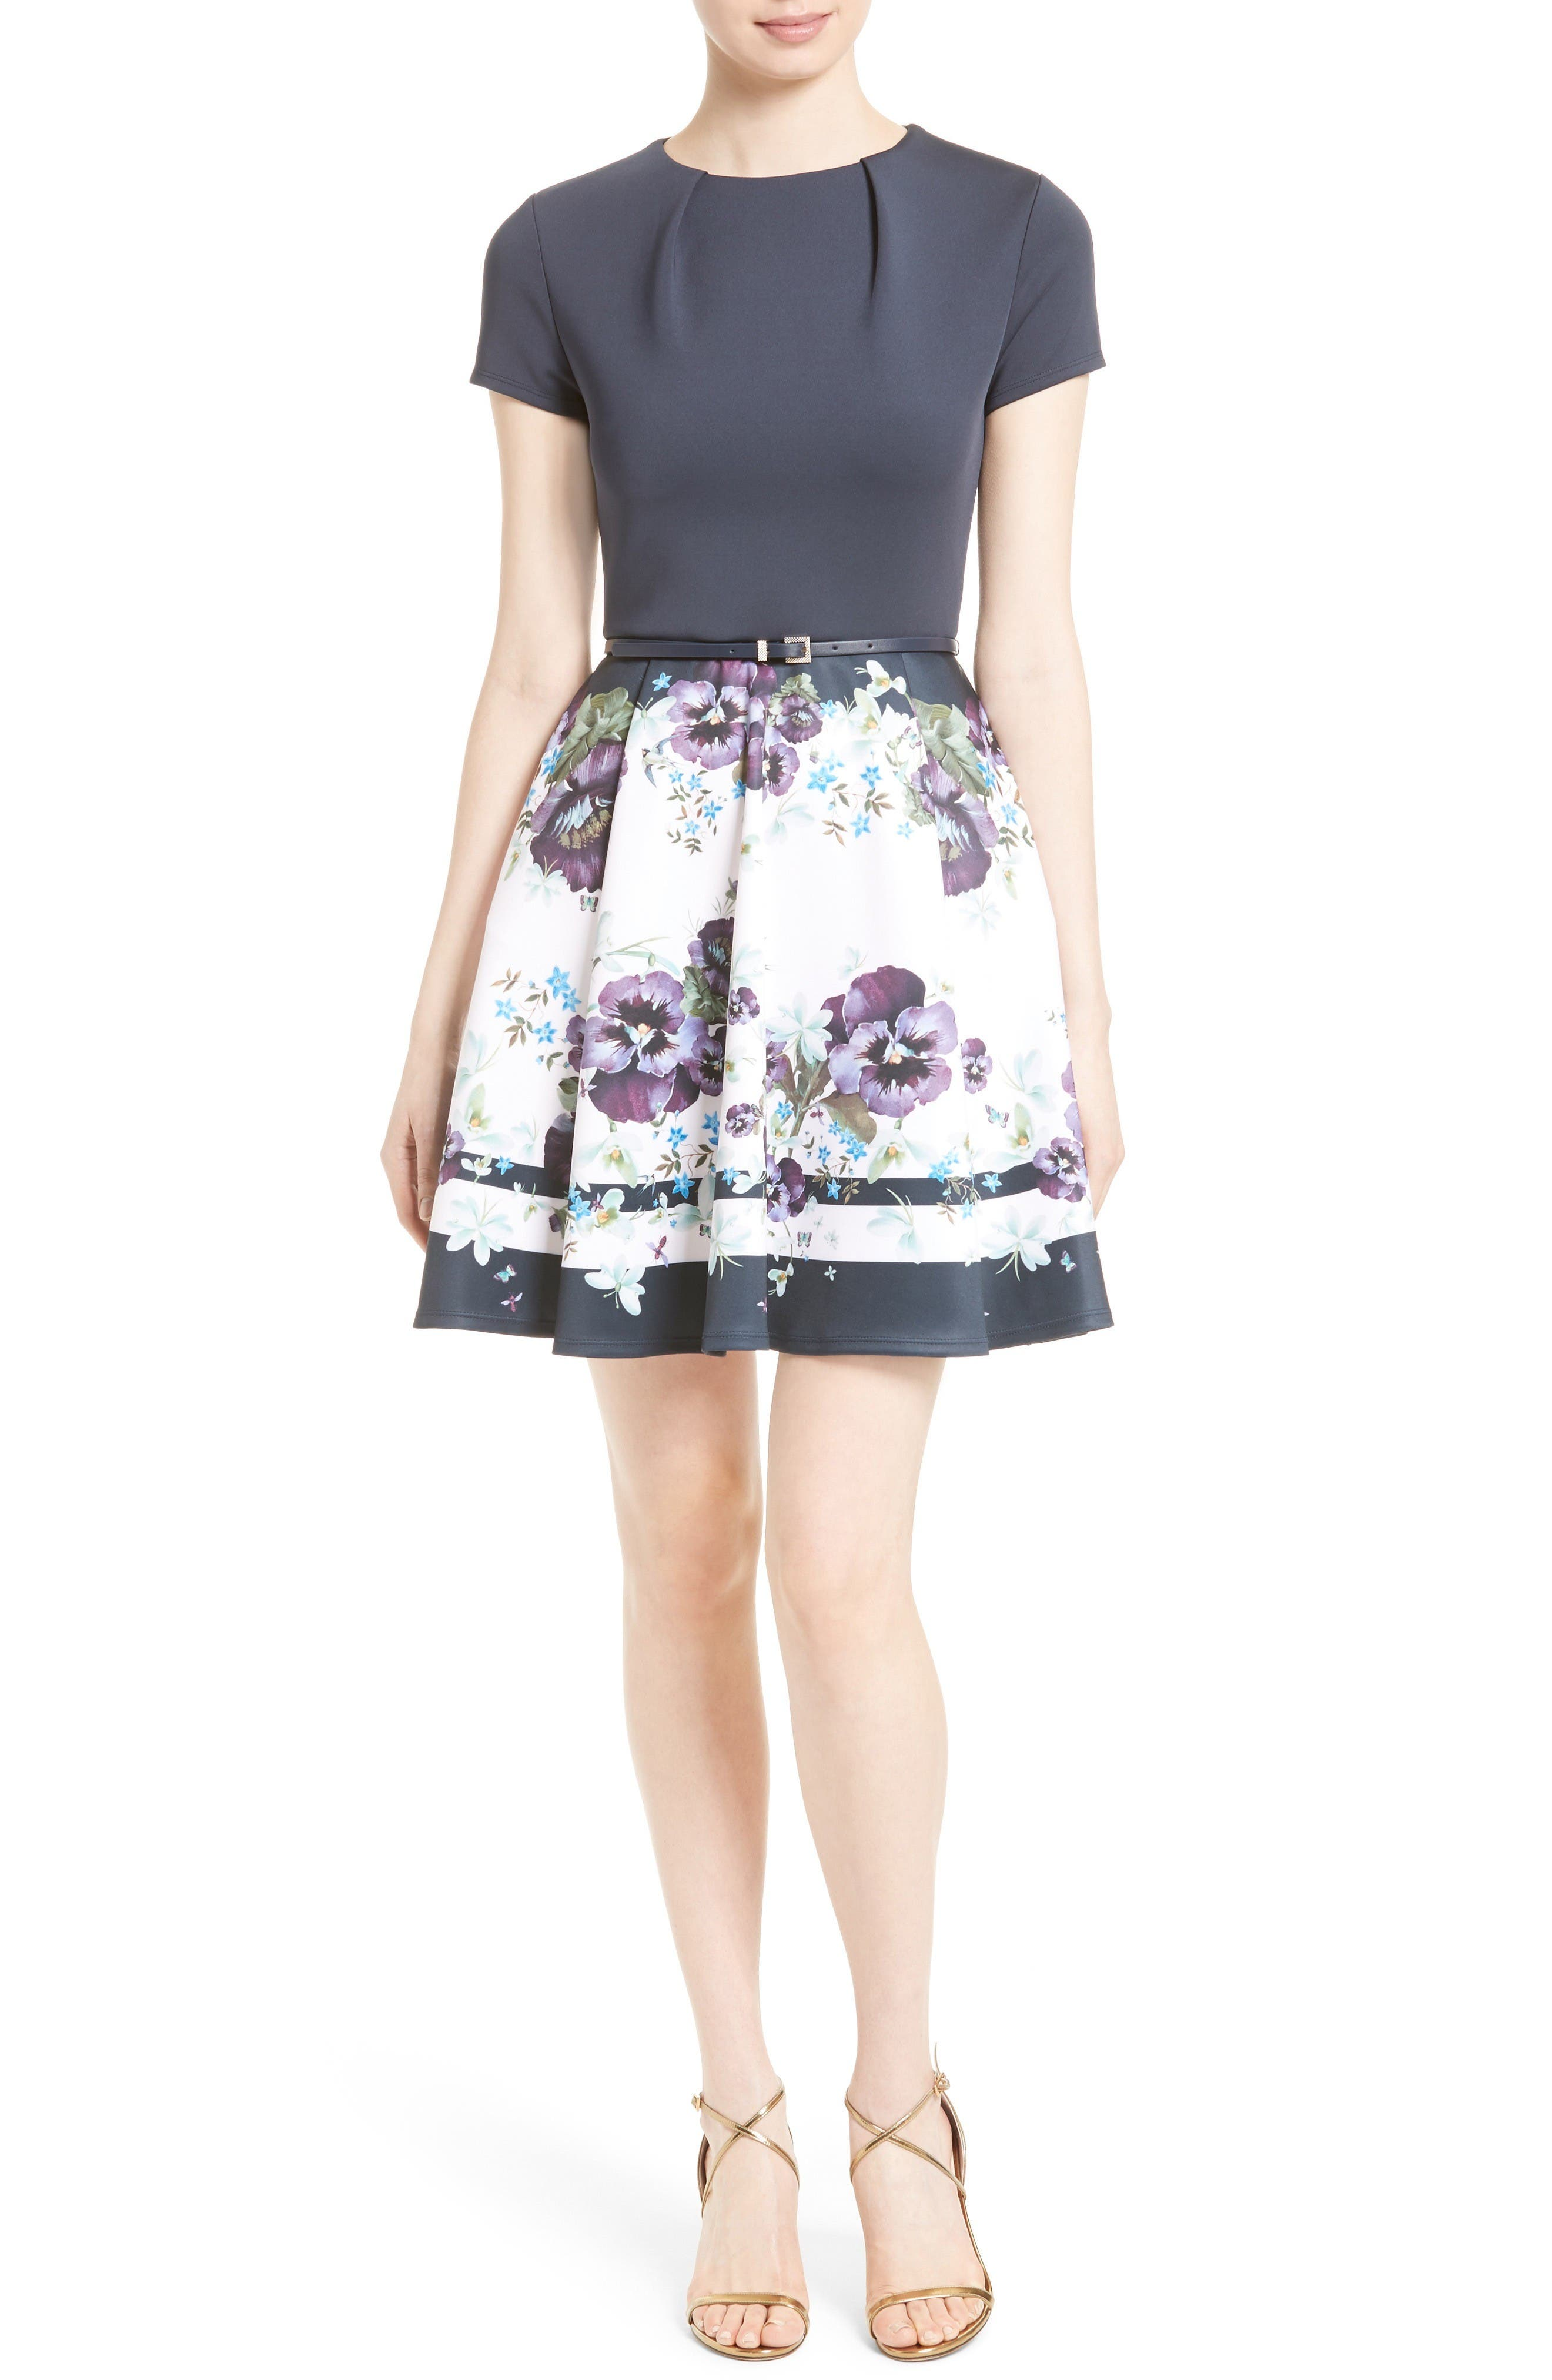 Alternate Image 1 Selected - Ted Baker London Stefh Fit & Flare Dress